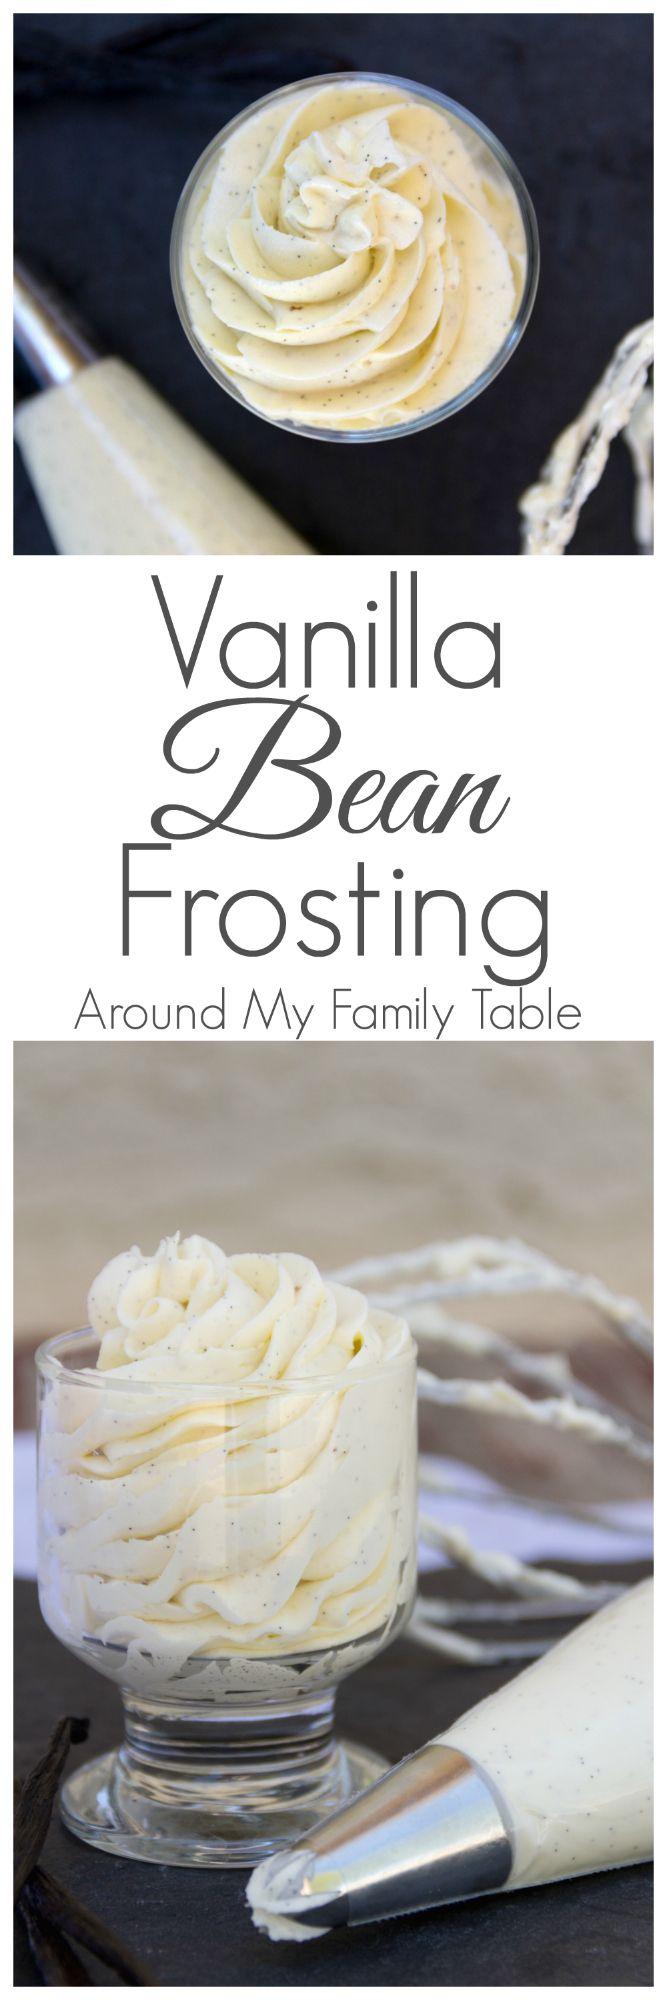 Vanilla Bean Frosting - Around My Family Table